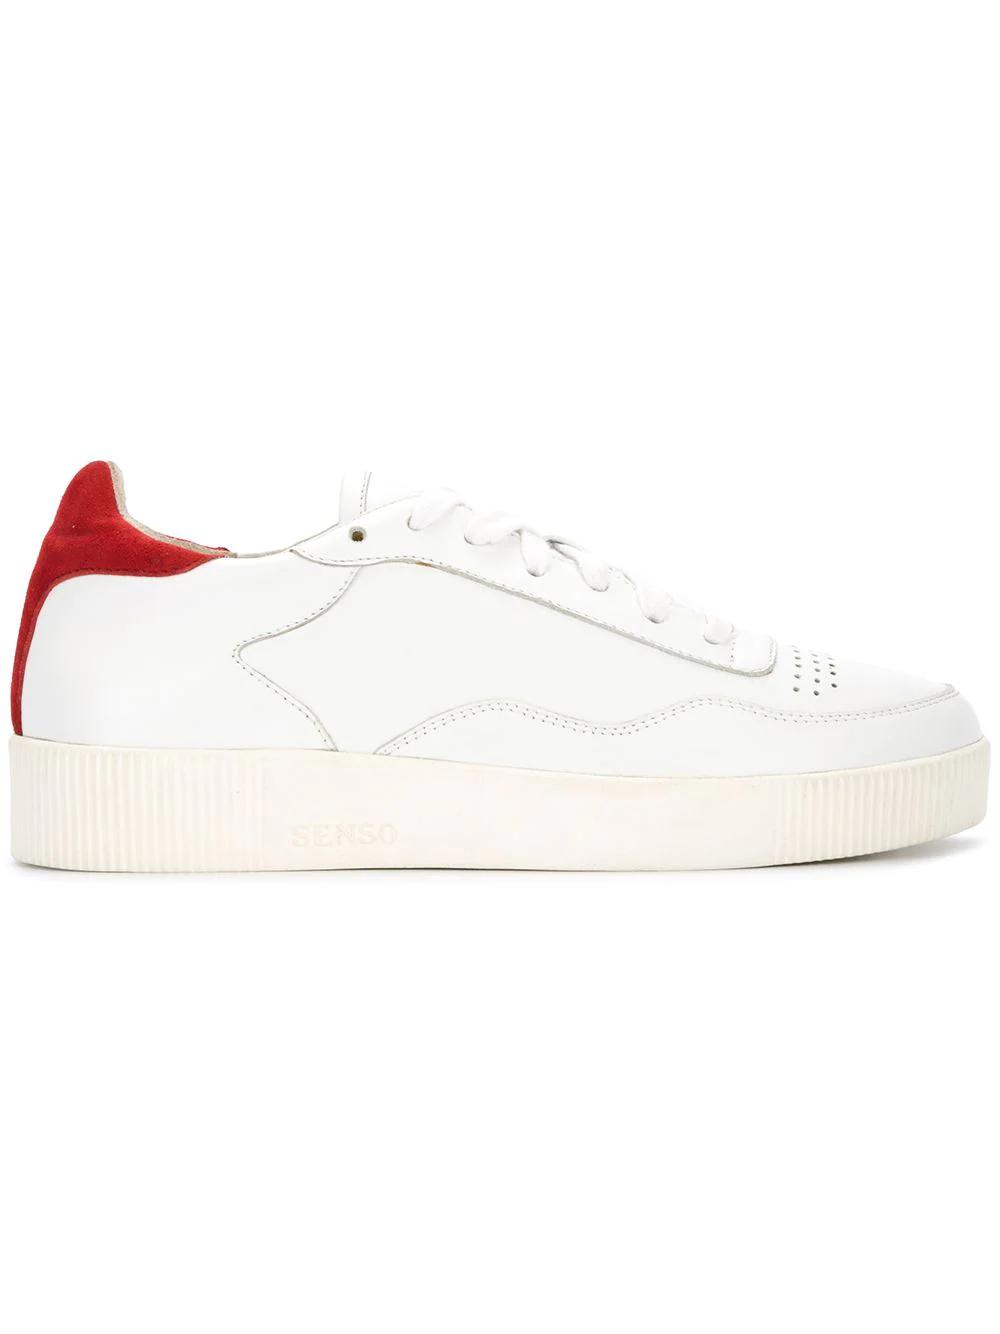 SENSO | кроссовки 'Arden' | Clouty